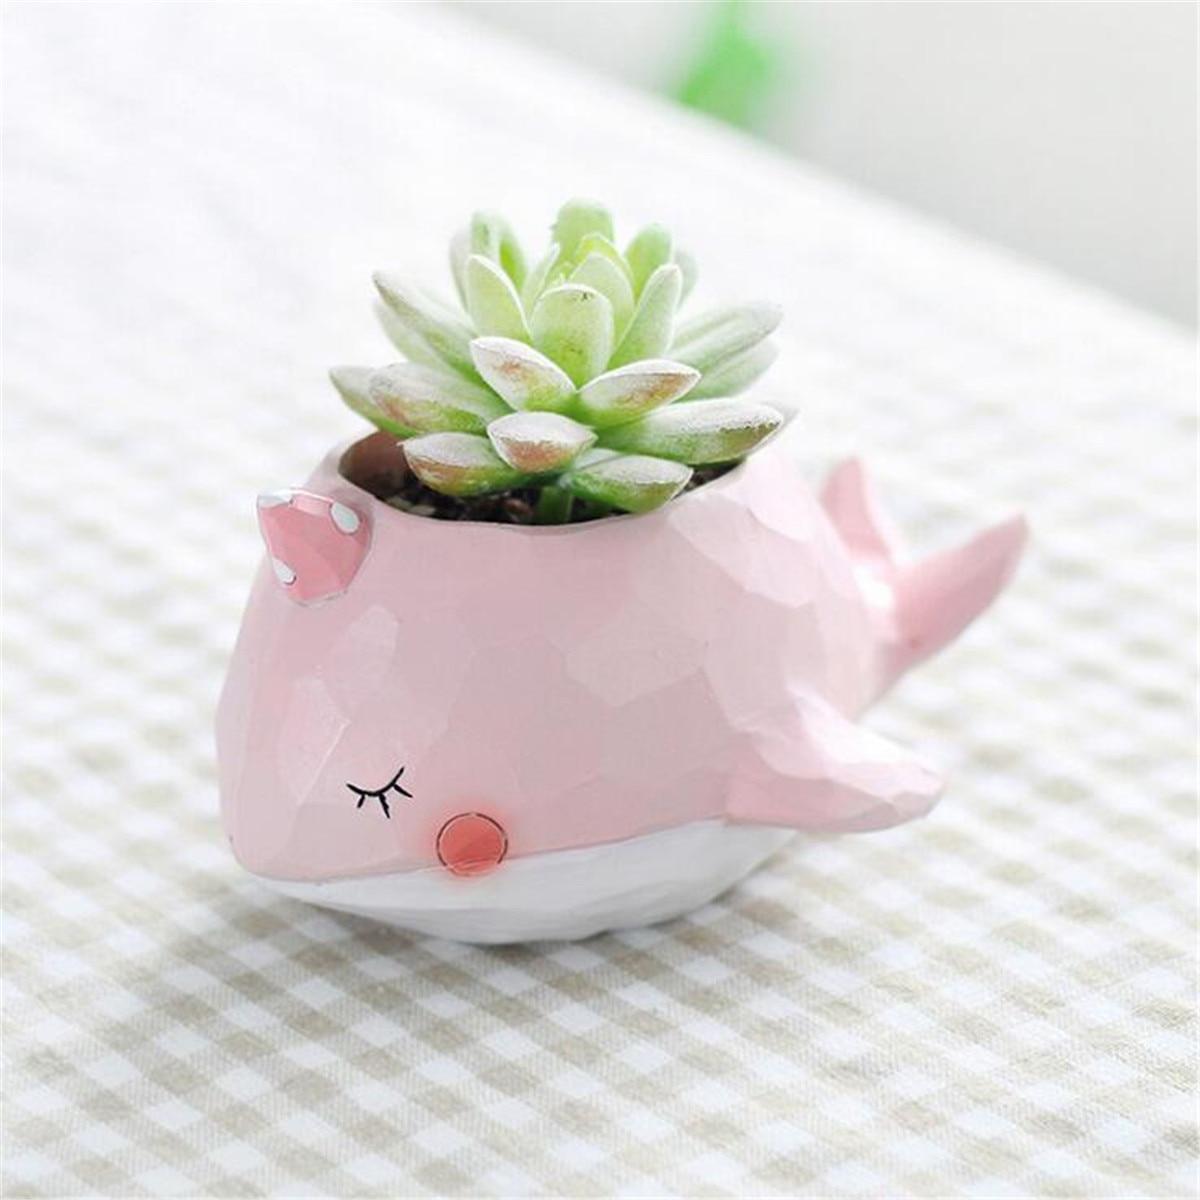 Animal Shape Resin Flower Pots Planter Small Succulent Plants Bonsai